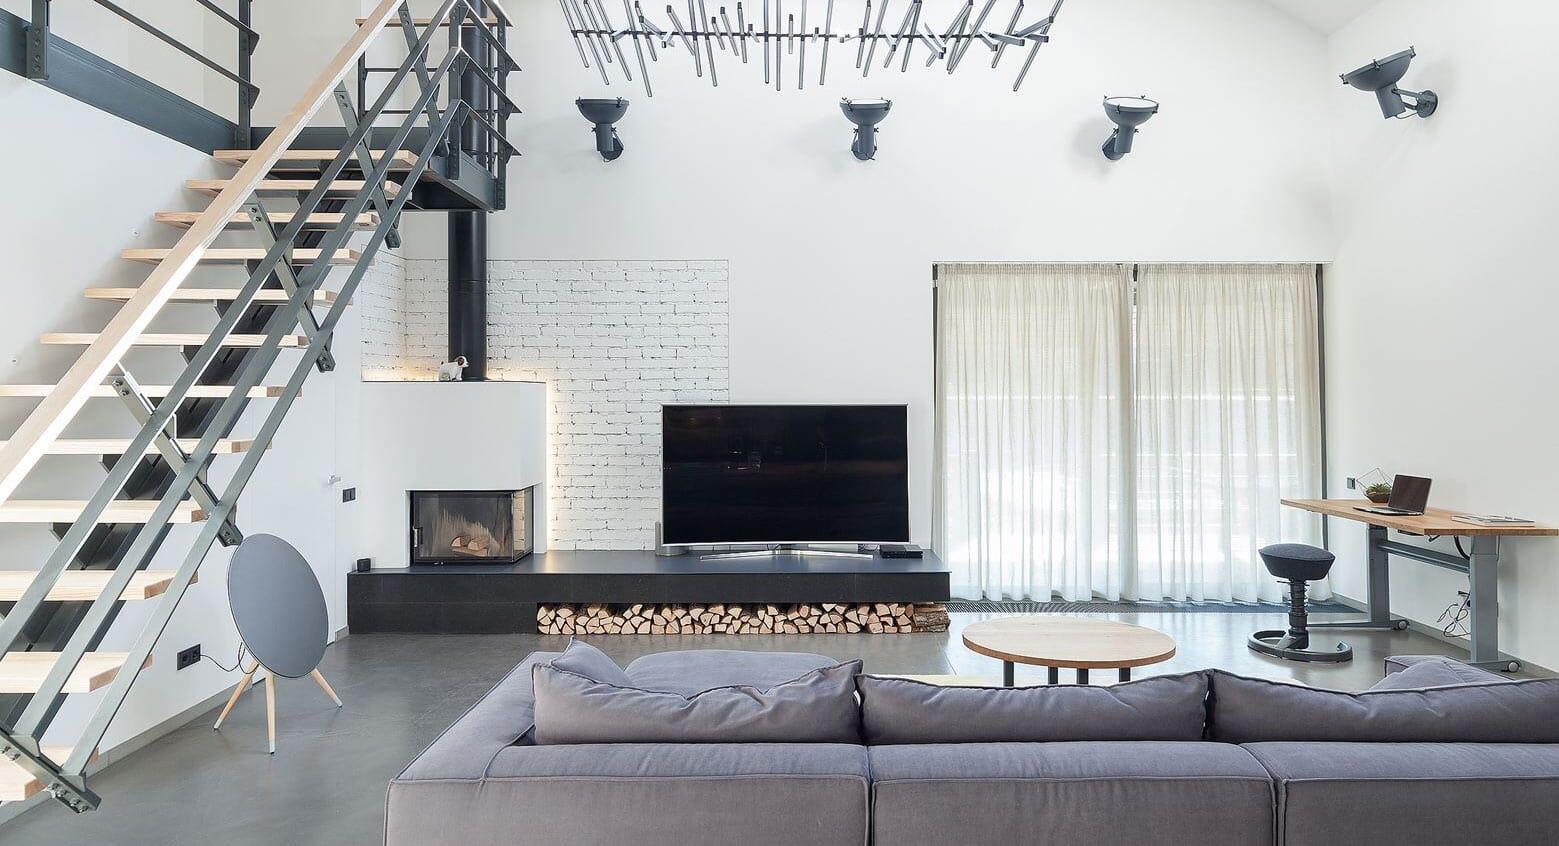 A Modern Suburban Home That Focuses on Minimalism